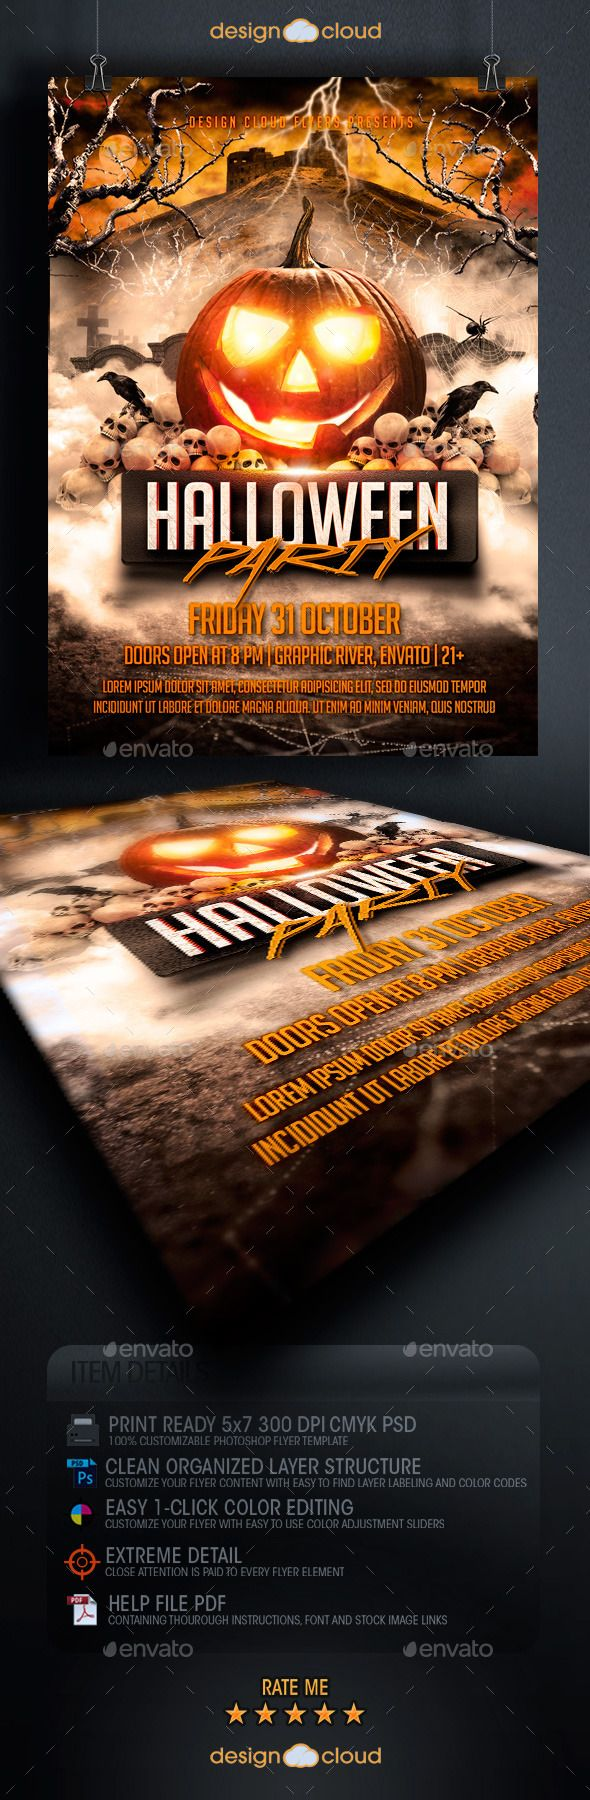 Cute Halloween Flyer Templates   www.galleryhip.com - The Hippest Pics Cute Halloween Flyer Templates